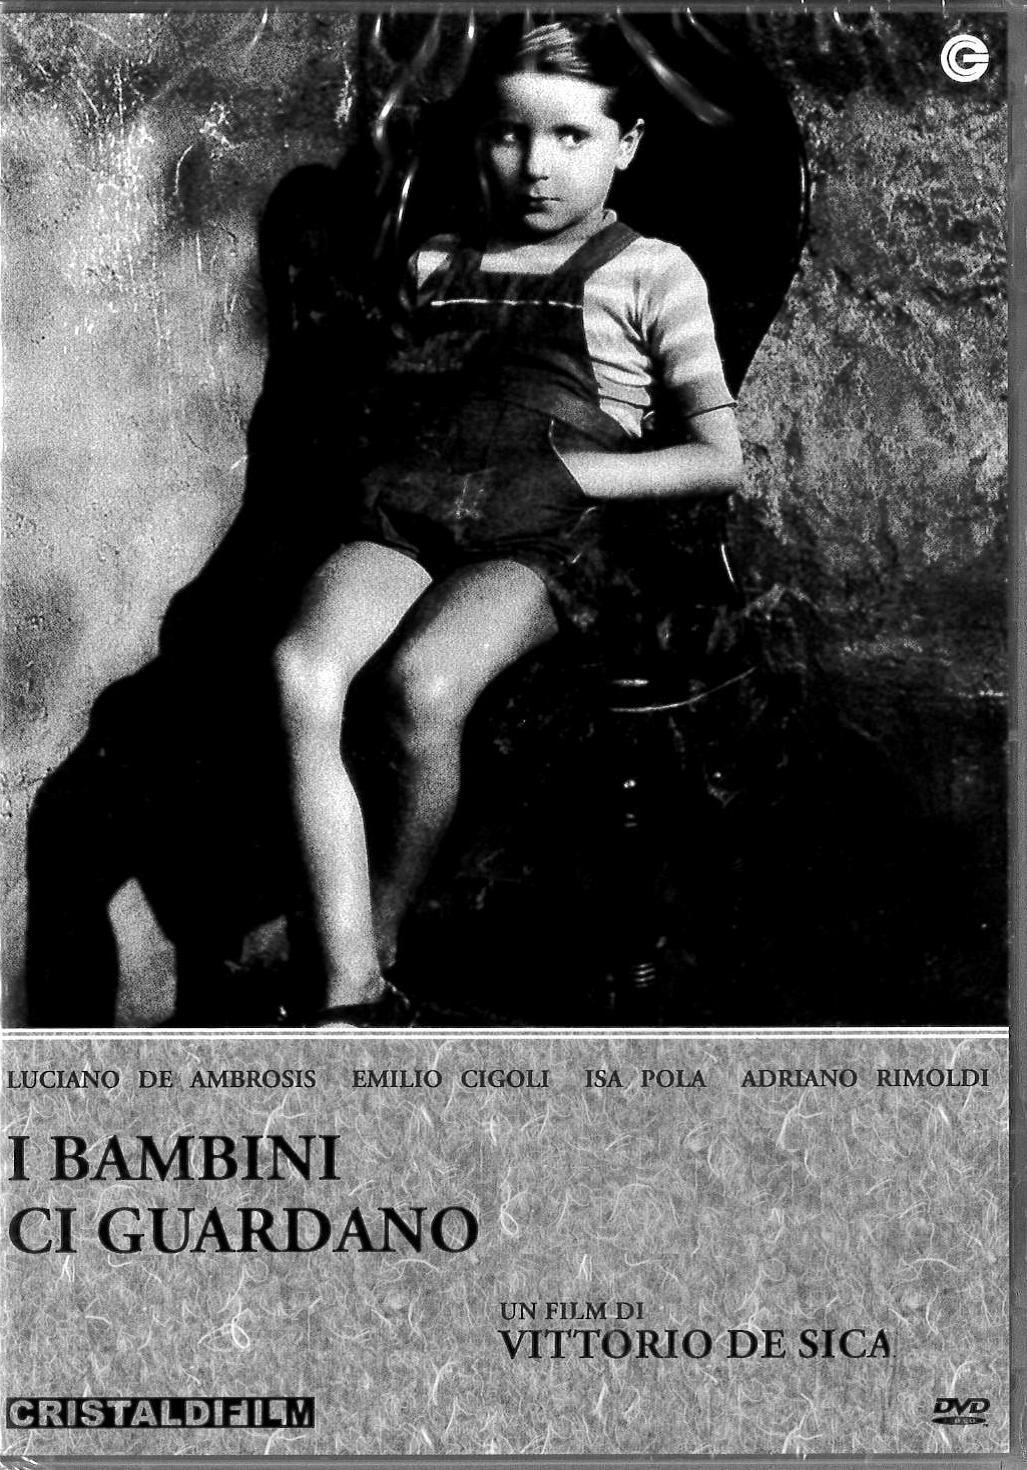 I BAMBINI CI GUARDANO (DVD)